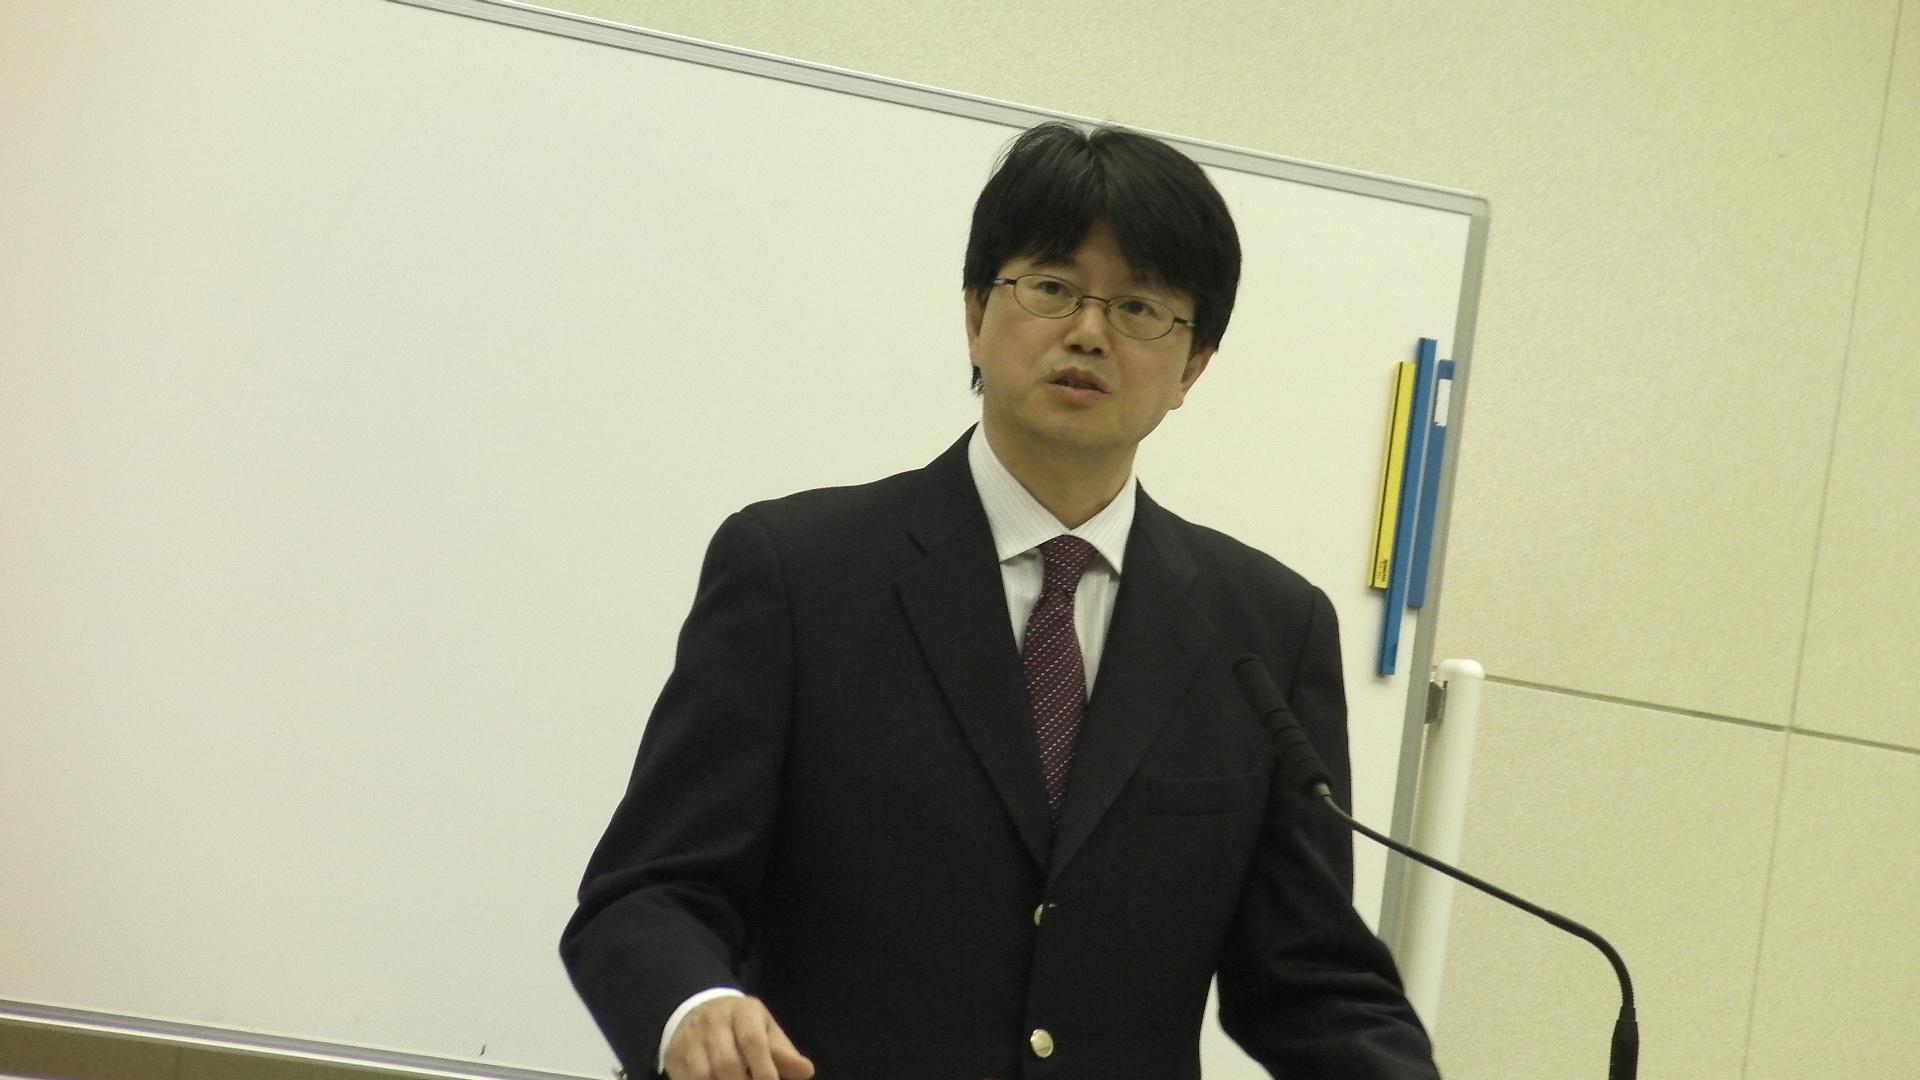 http://daily.magazine9.jp/m9/oshidori/SANY0639.JPG